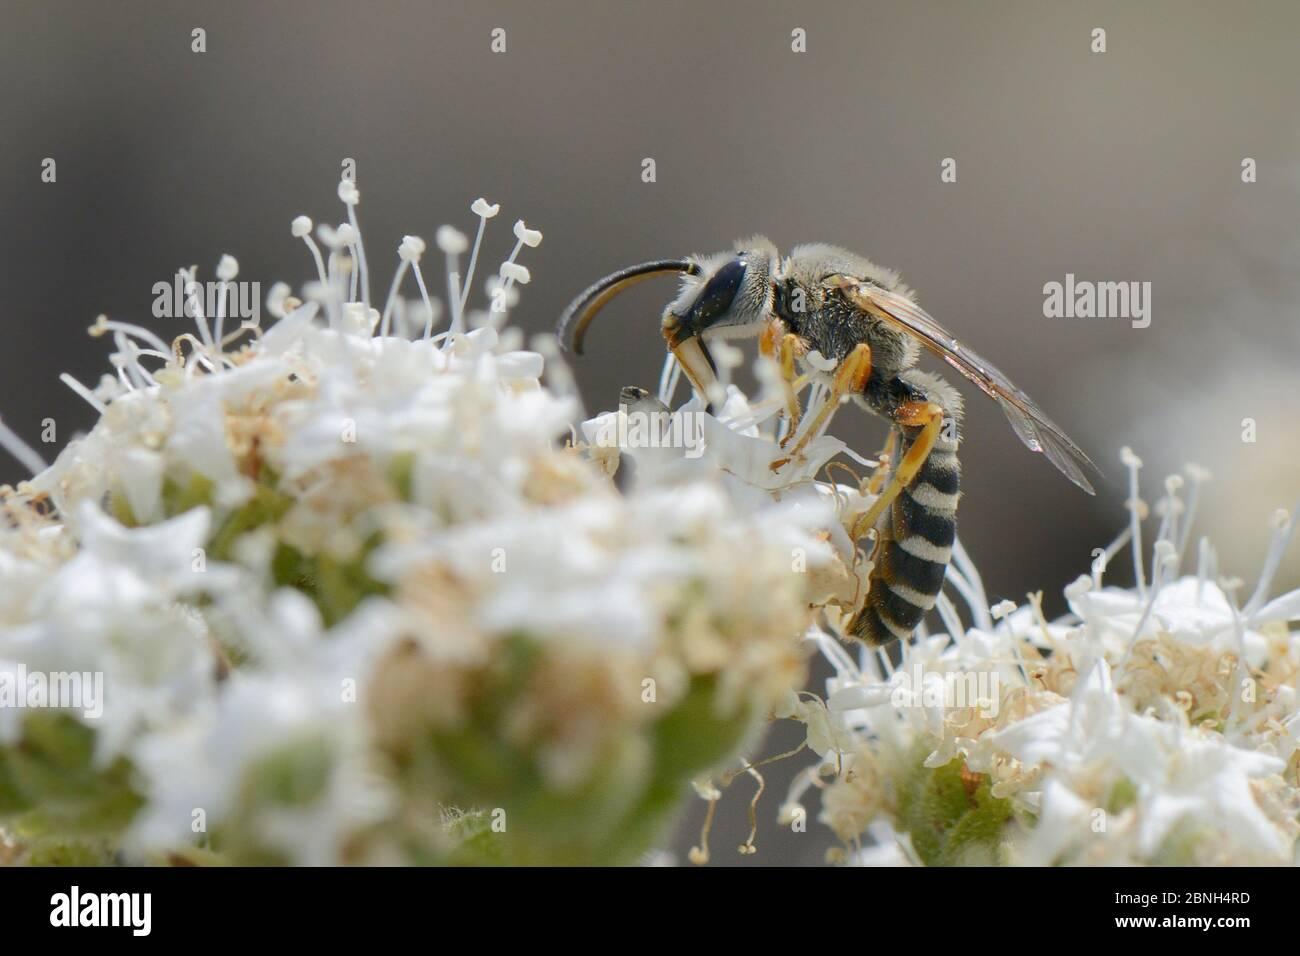 Abeja sudoríca (Halictus cf. Brunnescens) forrajeo femenino en el organo cretense (Origanum onites), Lesbos/ Lesvos, Grecia. Foto de stock